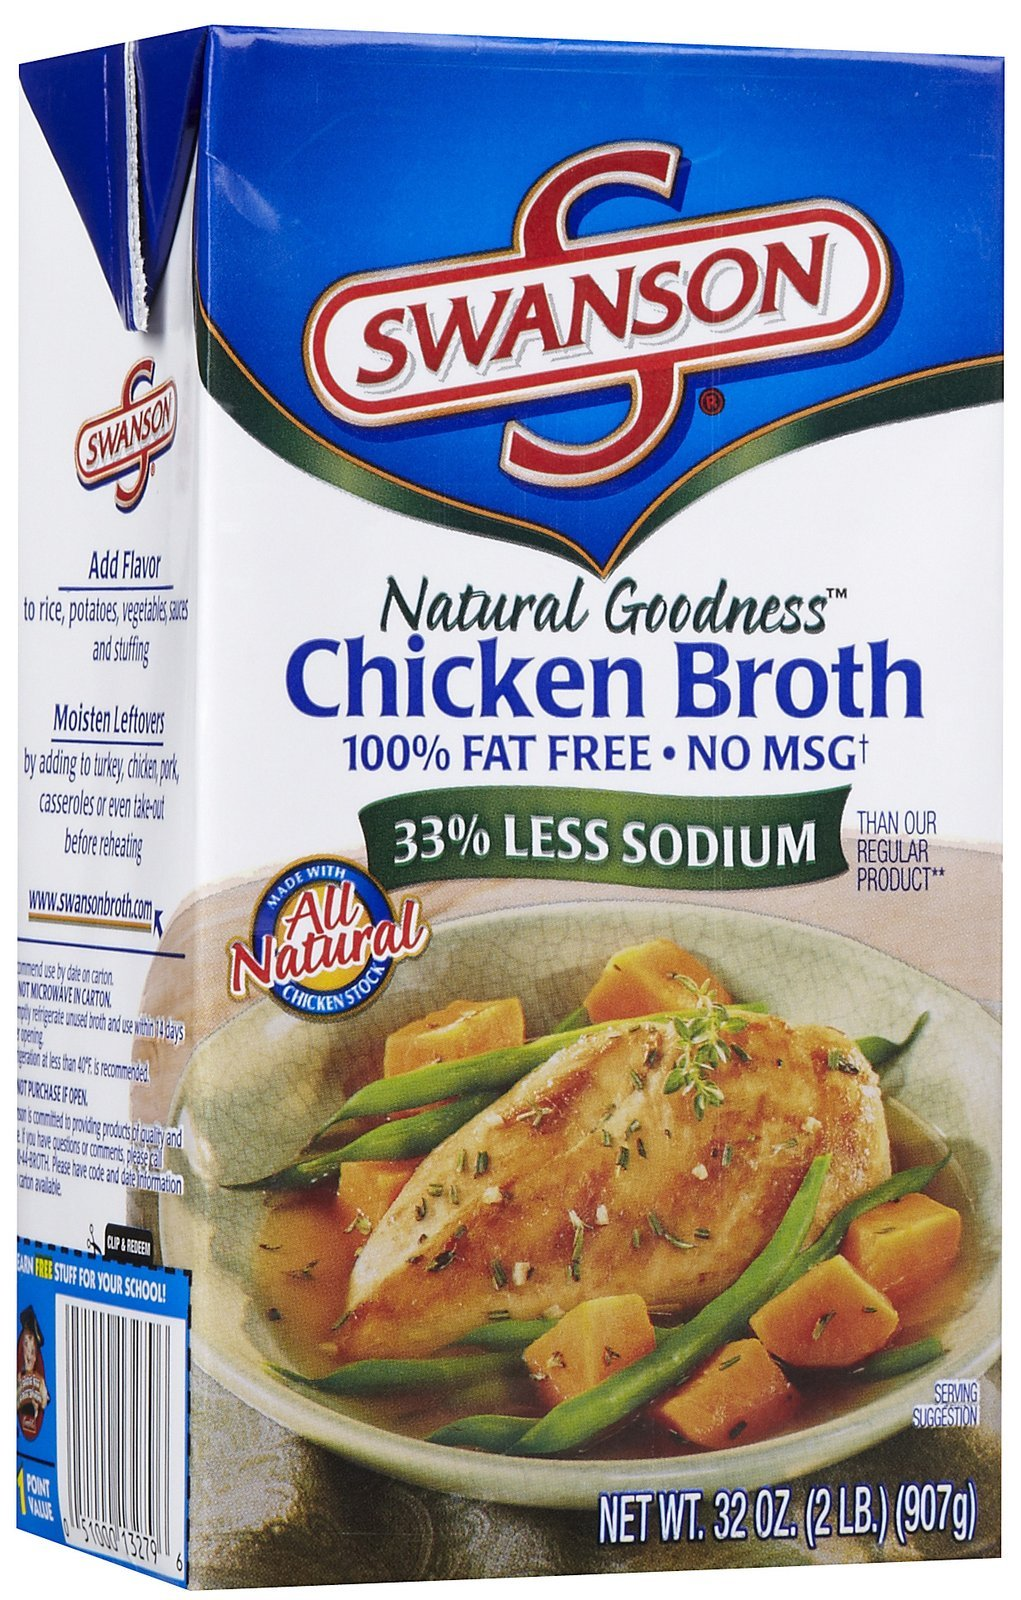 Swanson Natural Goodness Chicken Broth - 32 oz